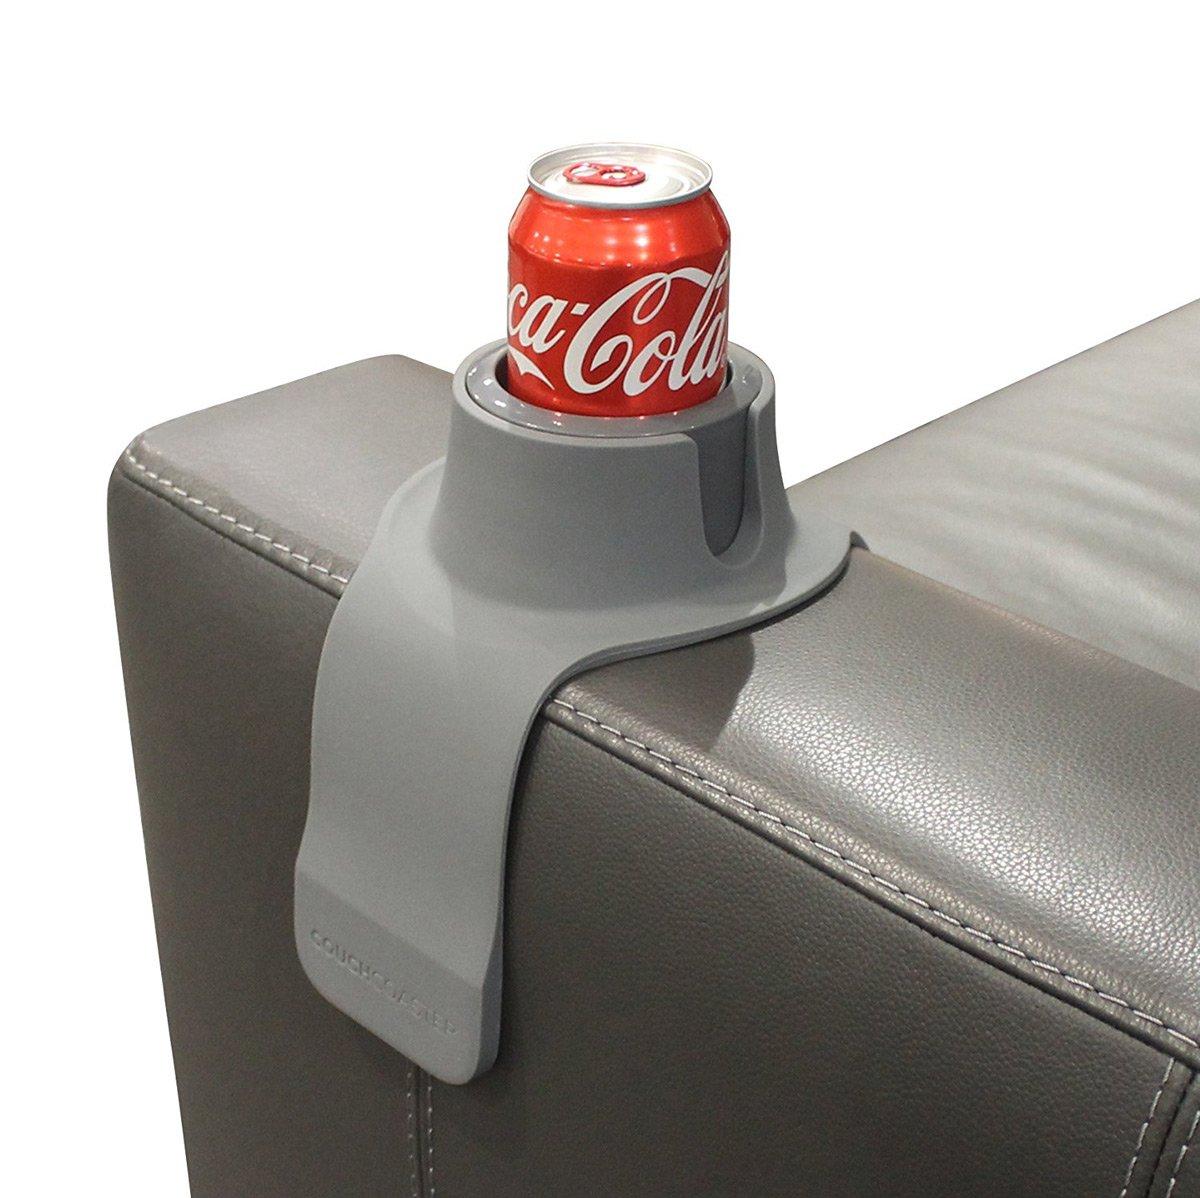 Couchcoaster Ultimate Sofa Drink Holder